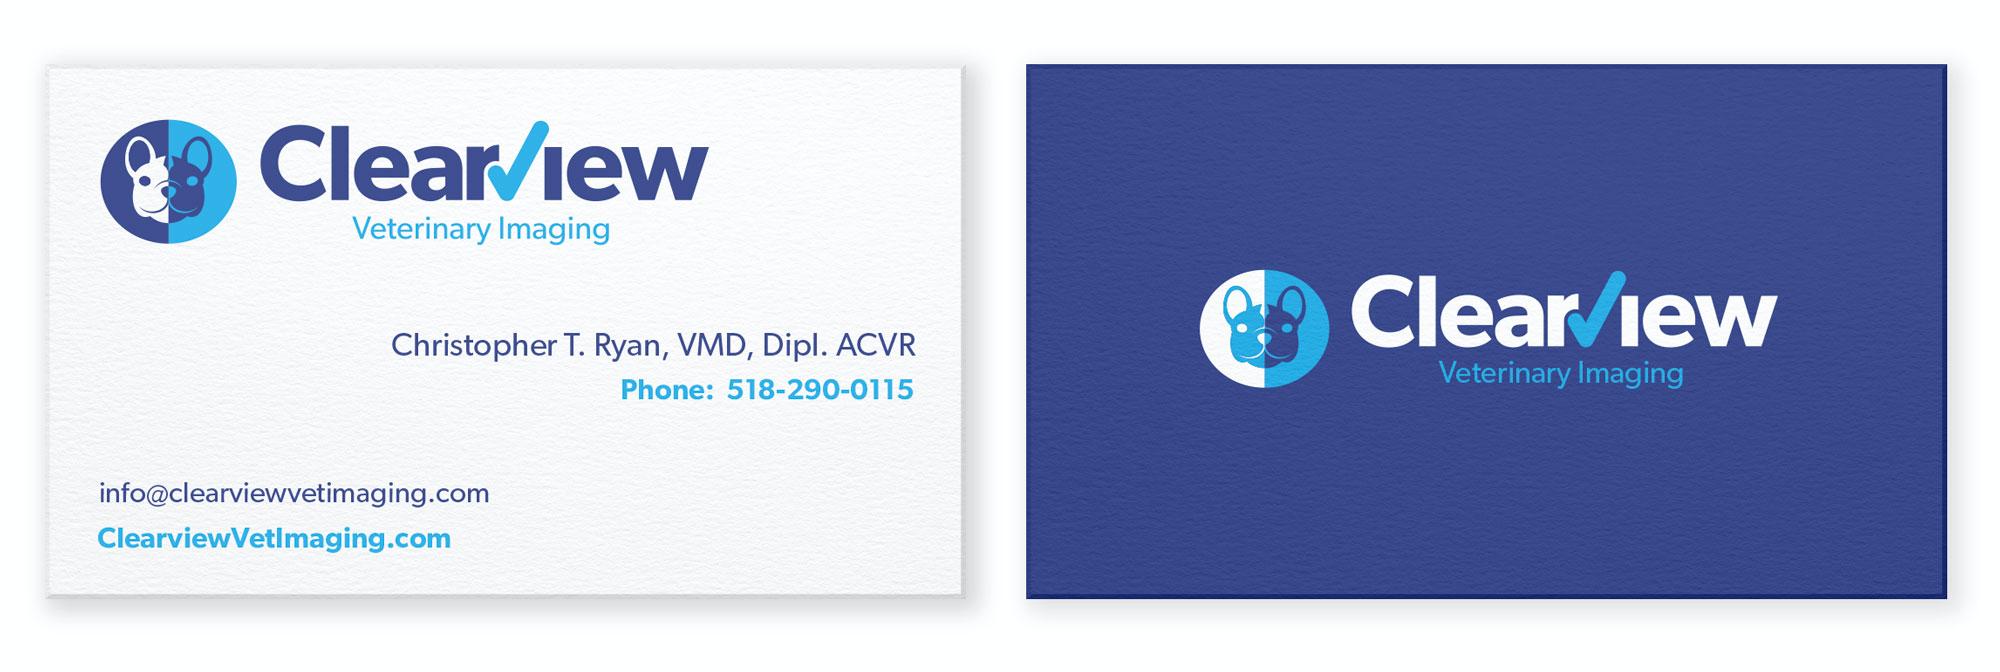 veterinary business card design